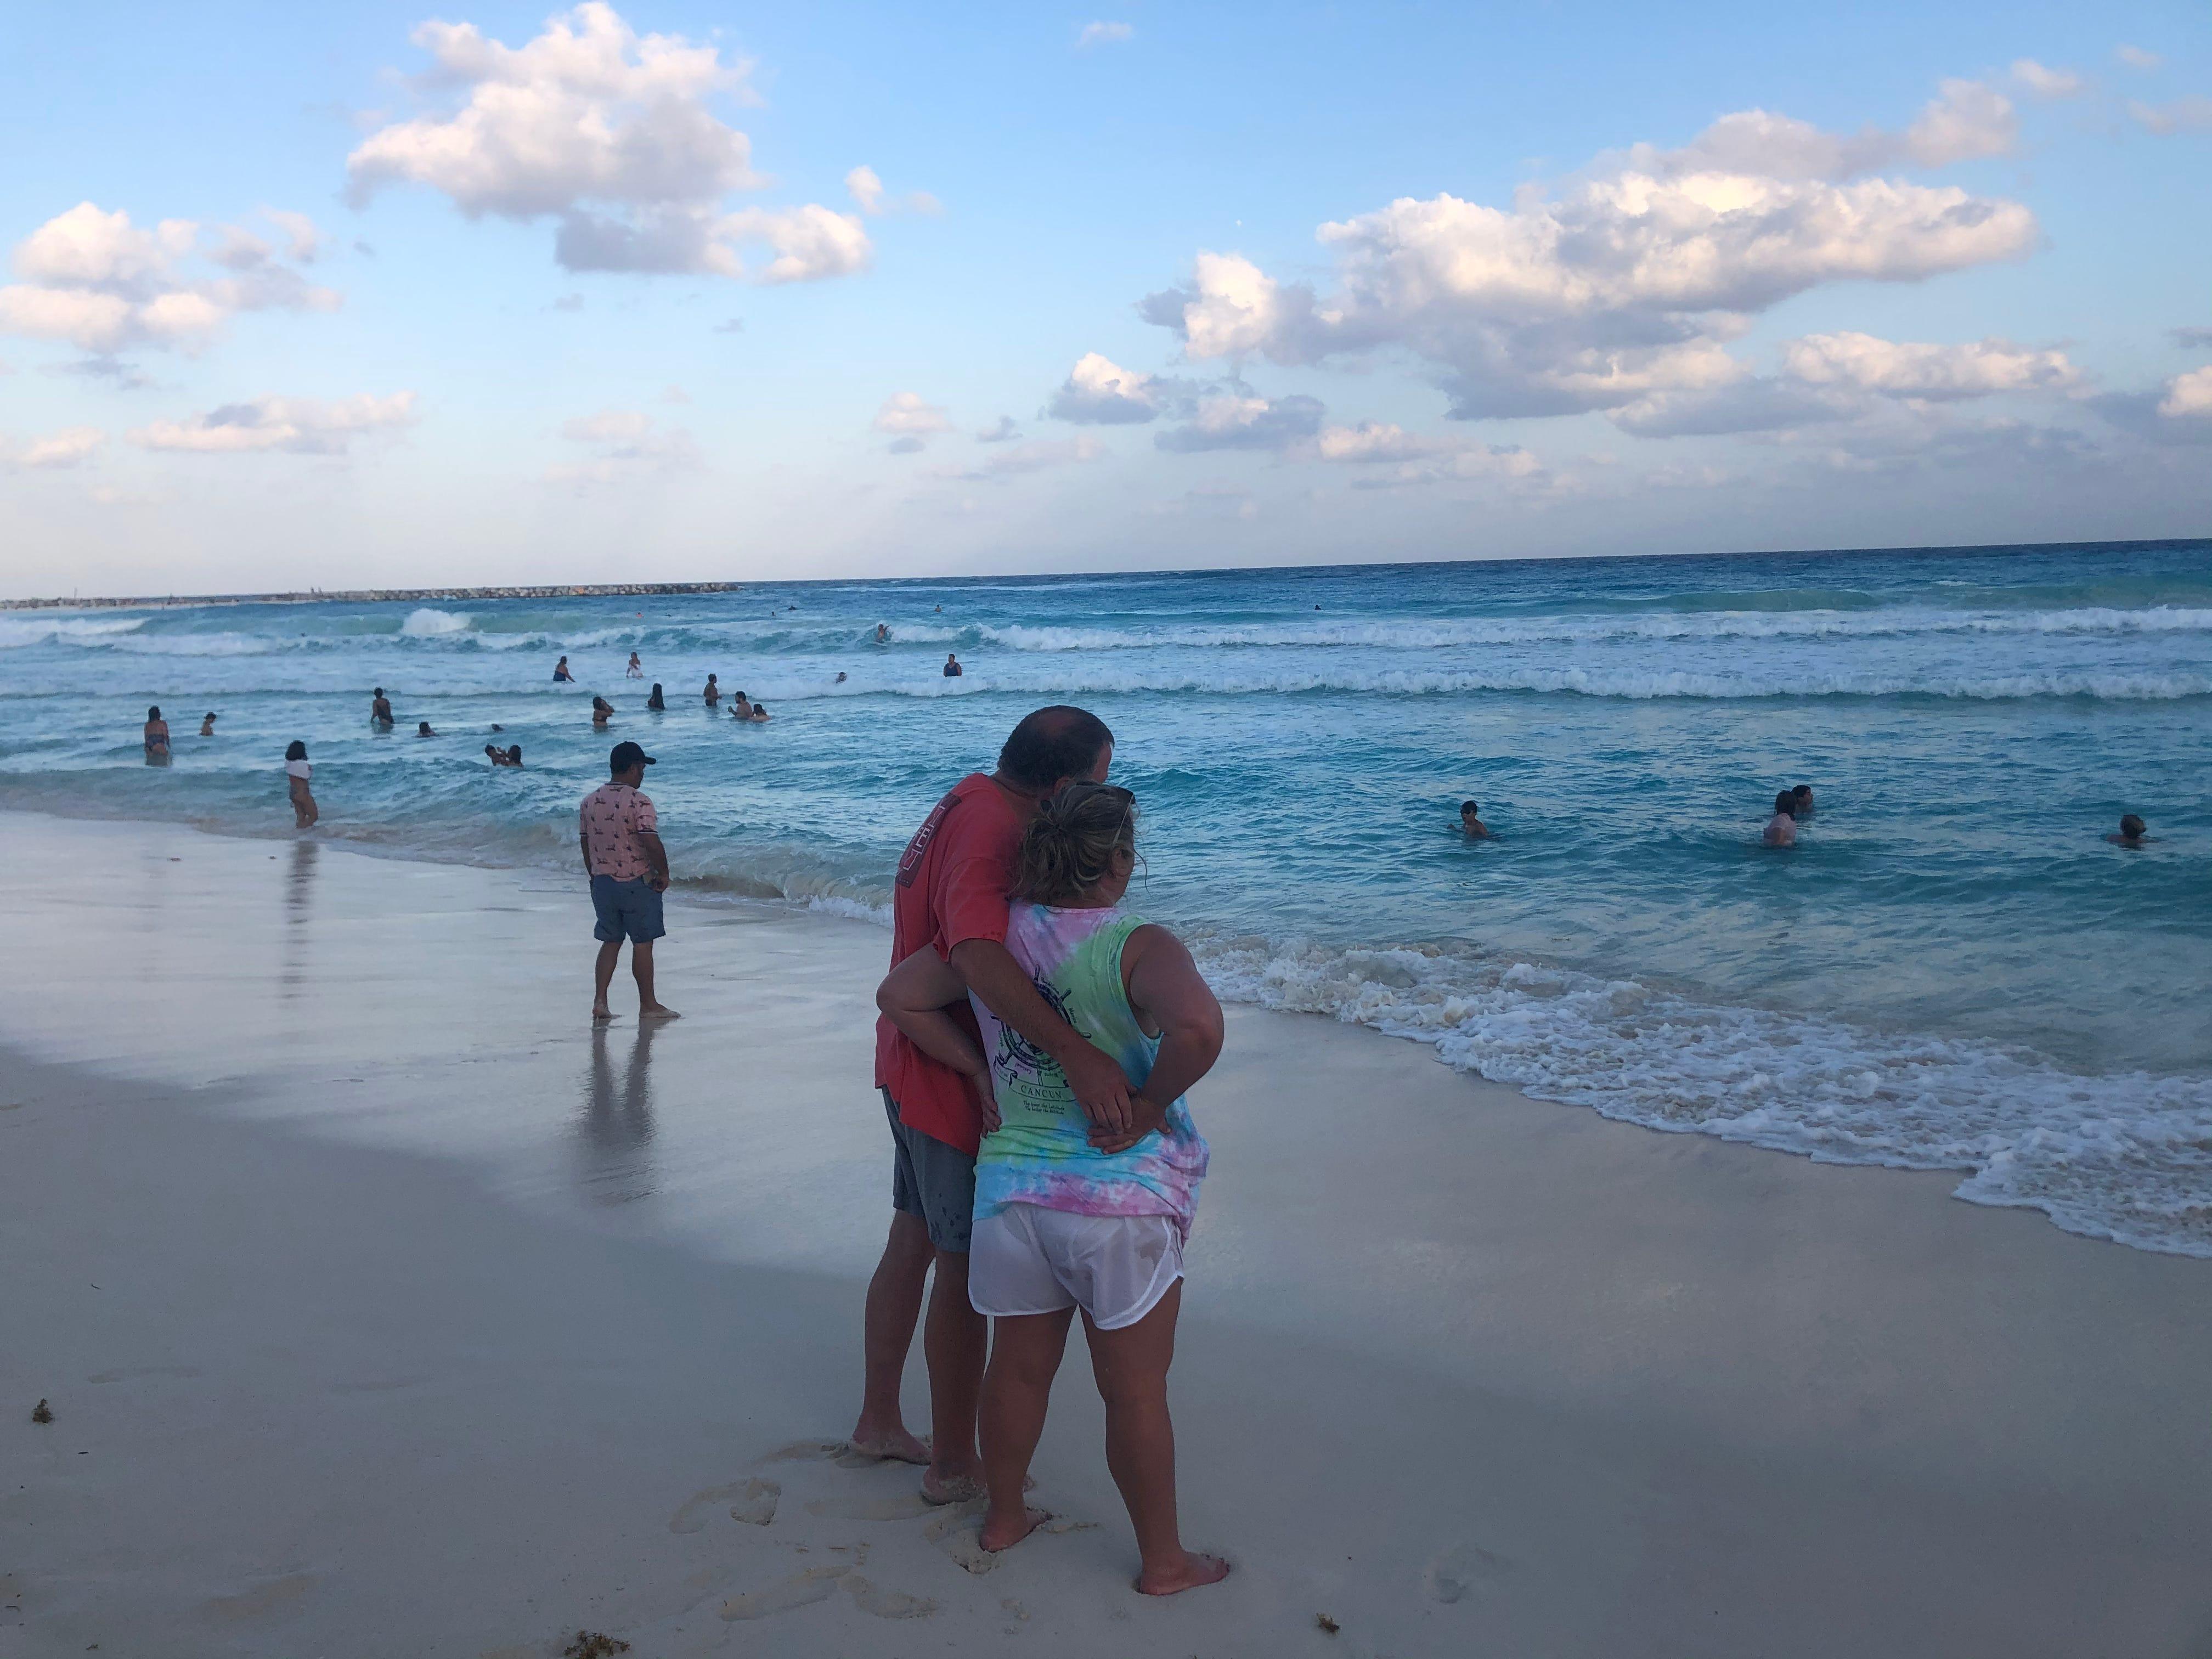 Cancun spring break amid the coronavirus pandemic